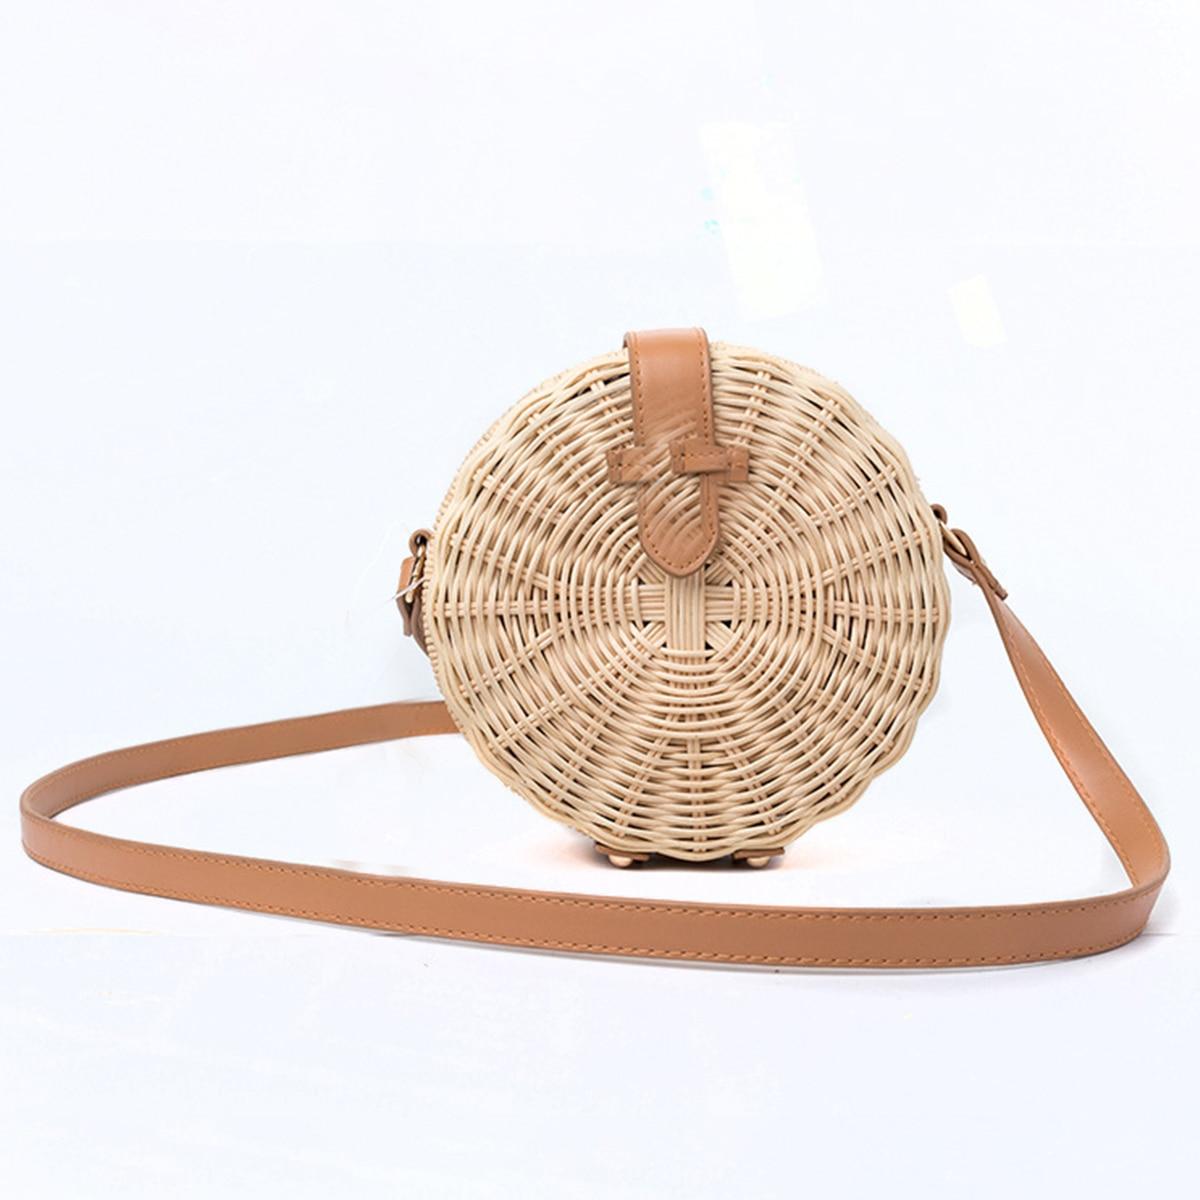 Bohemian Bali Rattan Bags For Women Small Circle Lady Straw Beach Handbags Summer Vintage Straw Bag Handmade Crossbody<br>